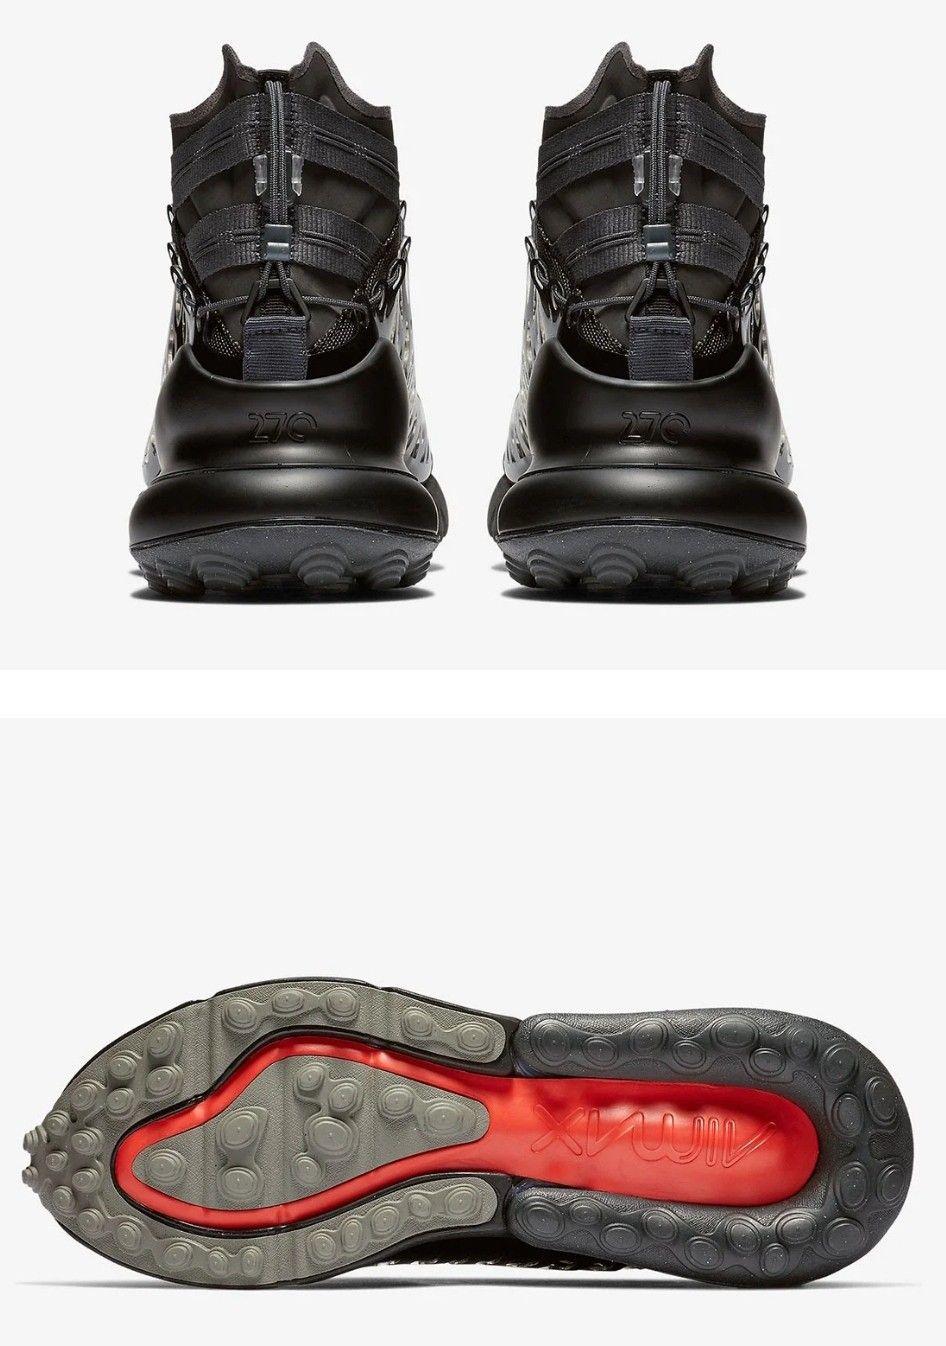 Nike ISPA Air Max 270 SP SOE Color: BlackAnthracite | Boots